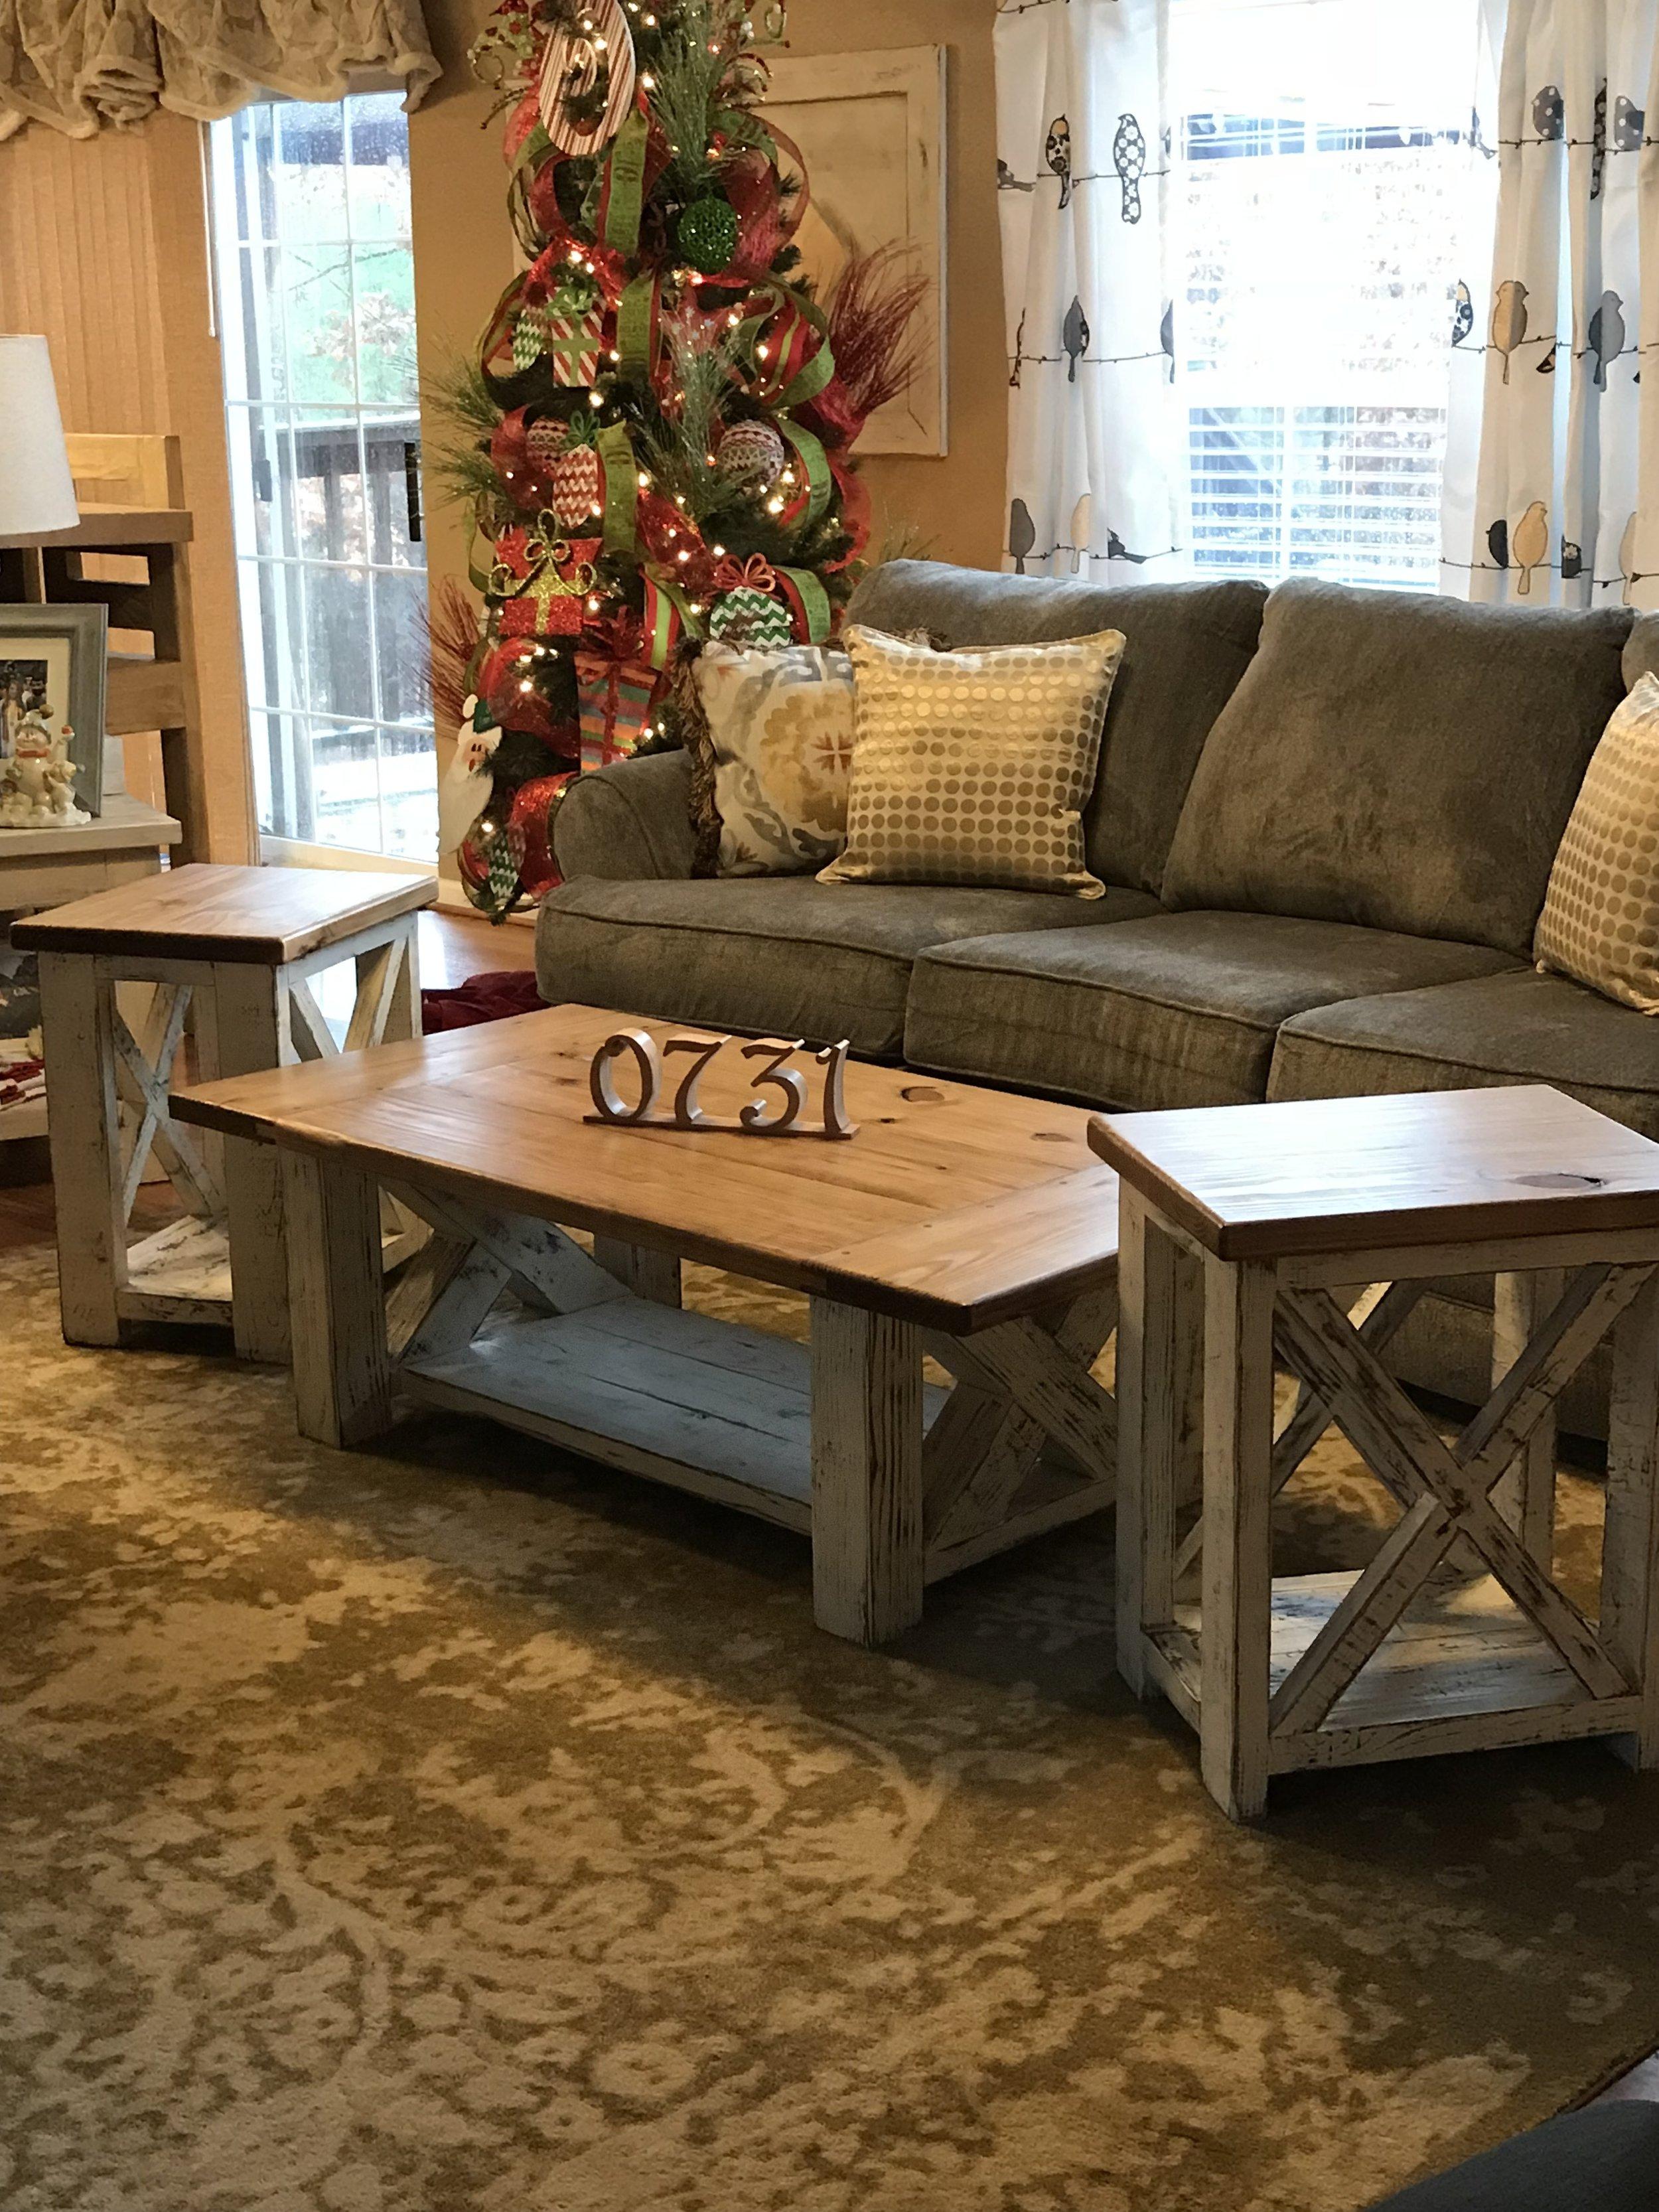 custom living room furniture big wall mirrors decor 731 woodworks we build diy farmhouse coffee table jpeg